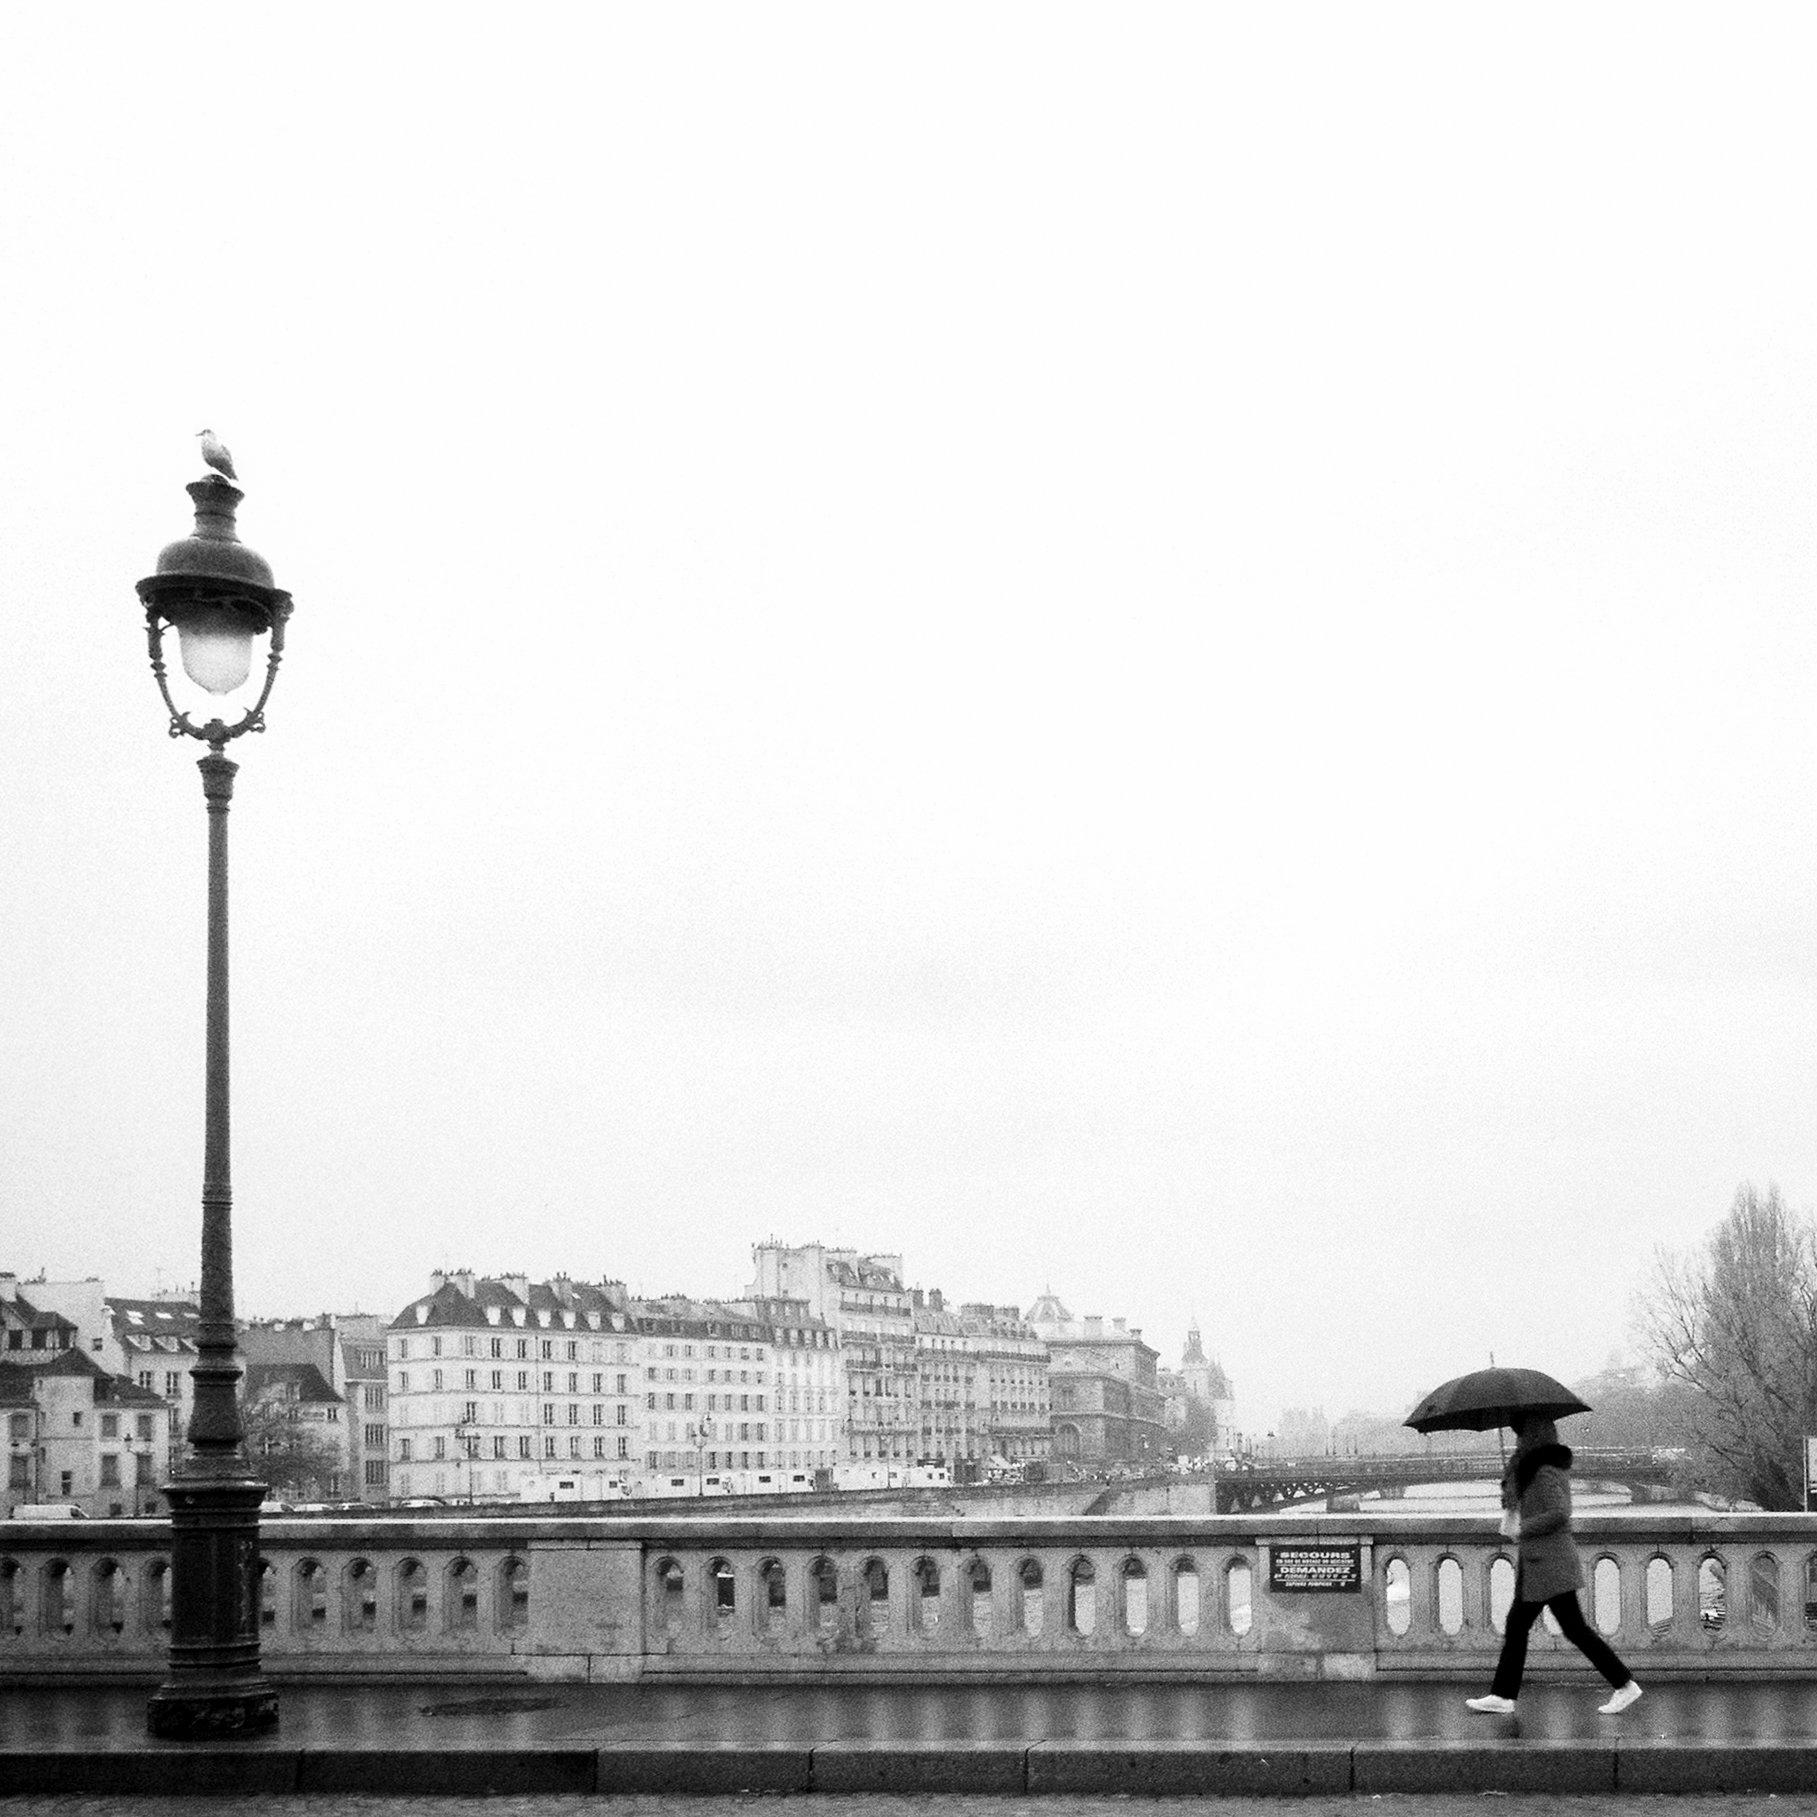 Paris Hasselblad B&W-0008.jpg